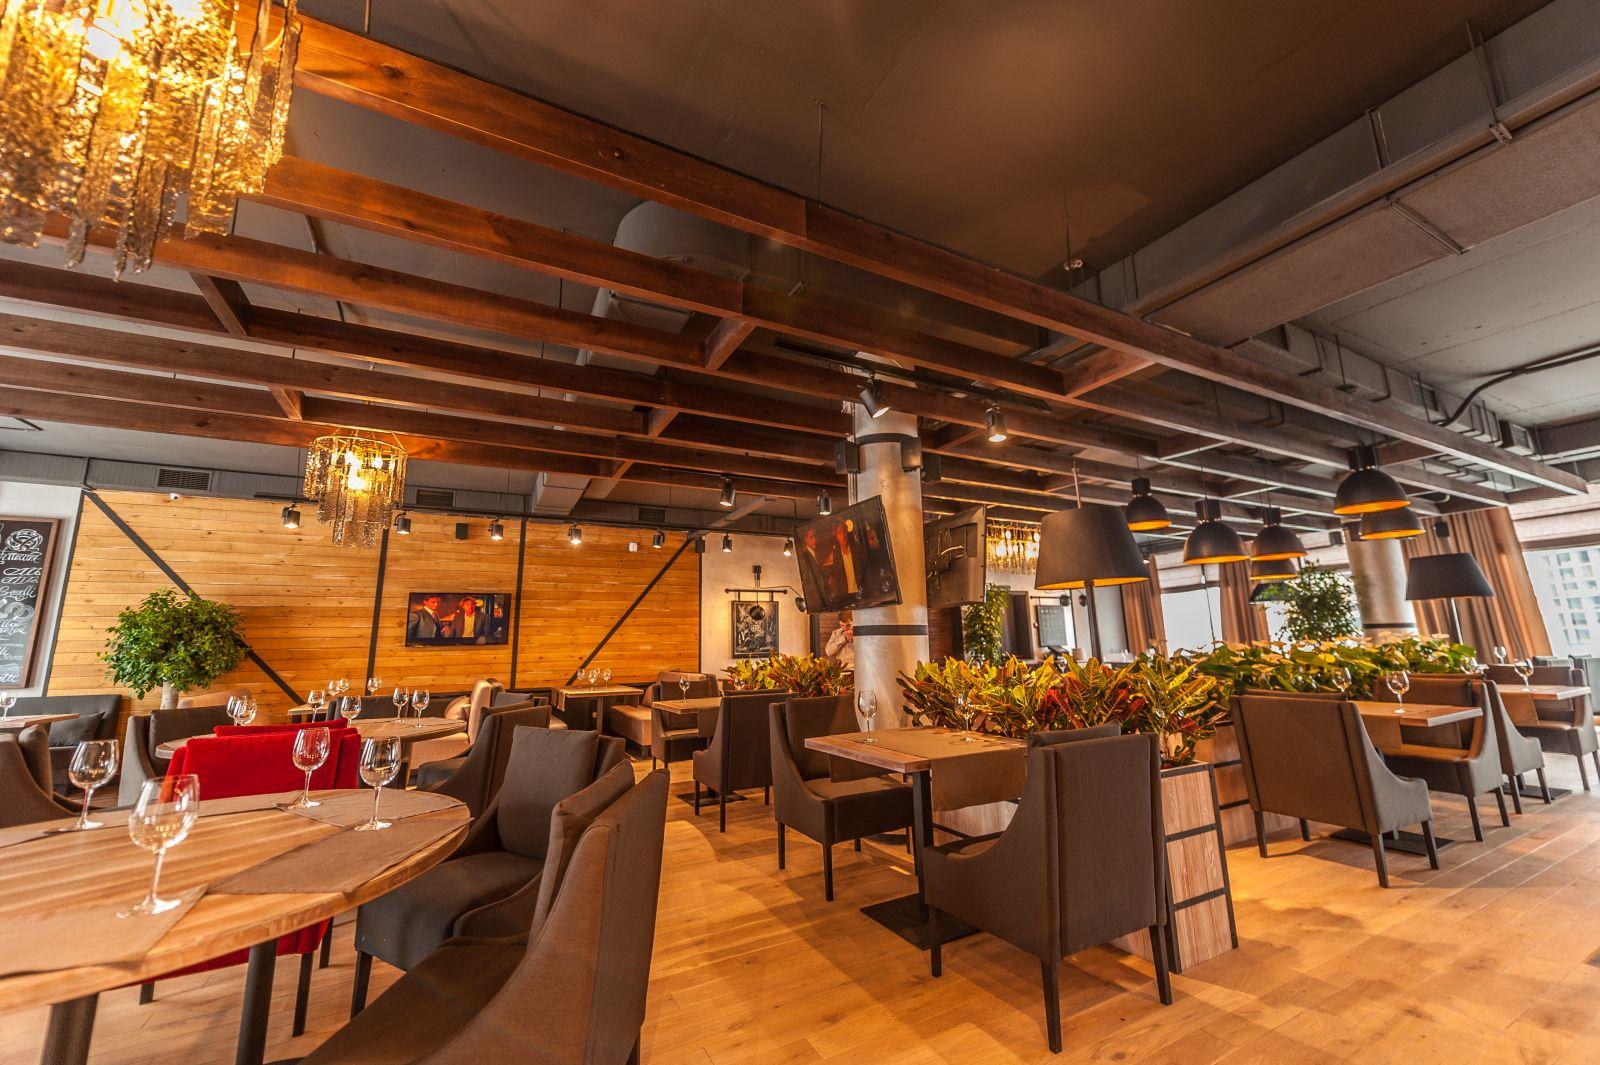 Ресторан недели: Веранда на Ривьере - фото №6